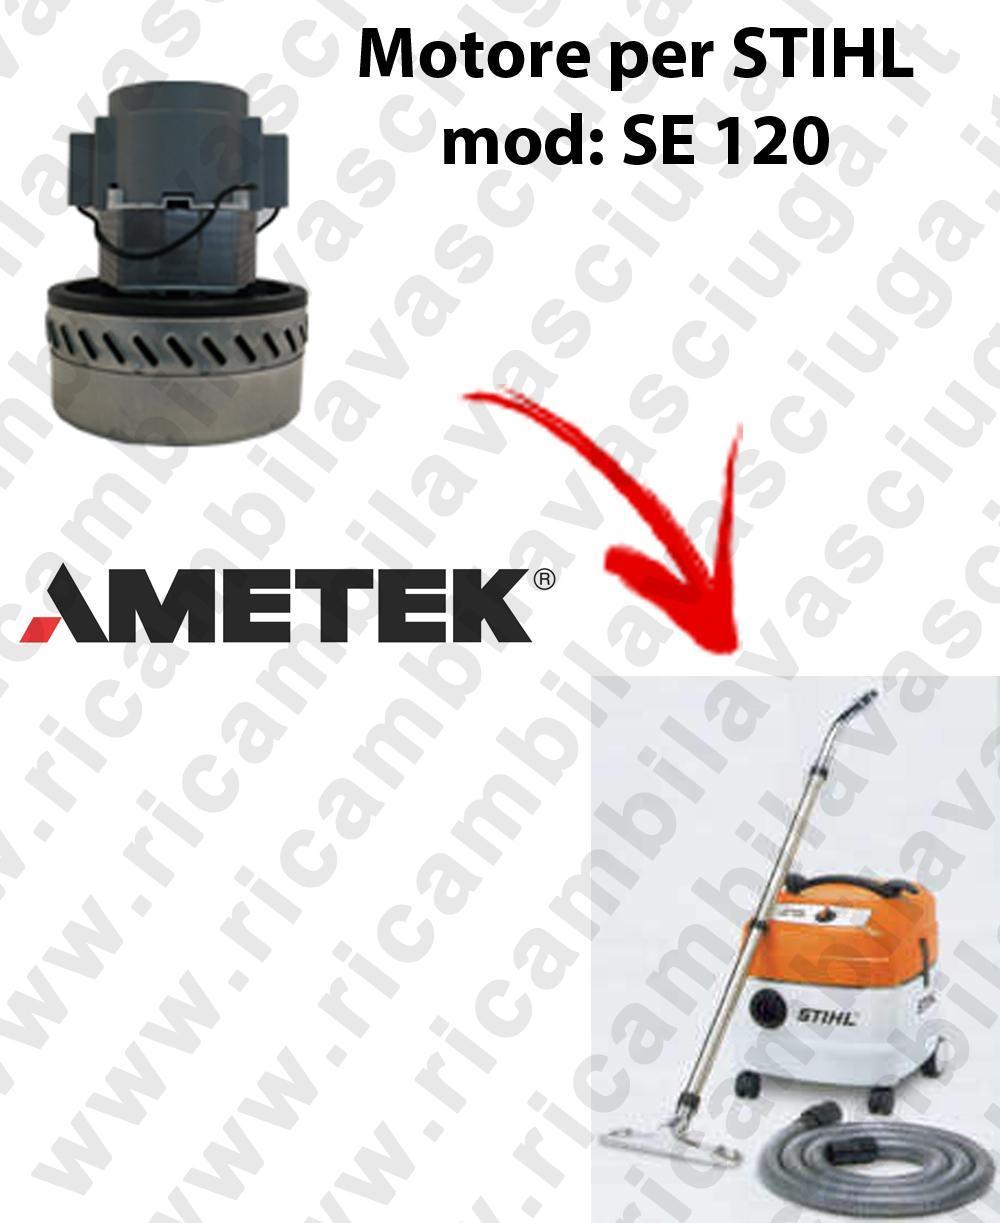 SE 120 Ametek Vacuum Motor for vacuum cleaner STIHL